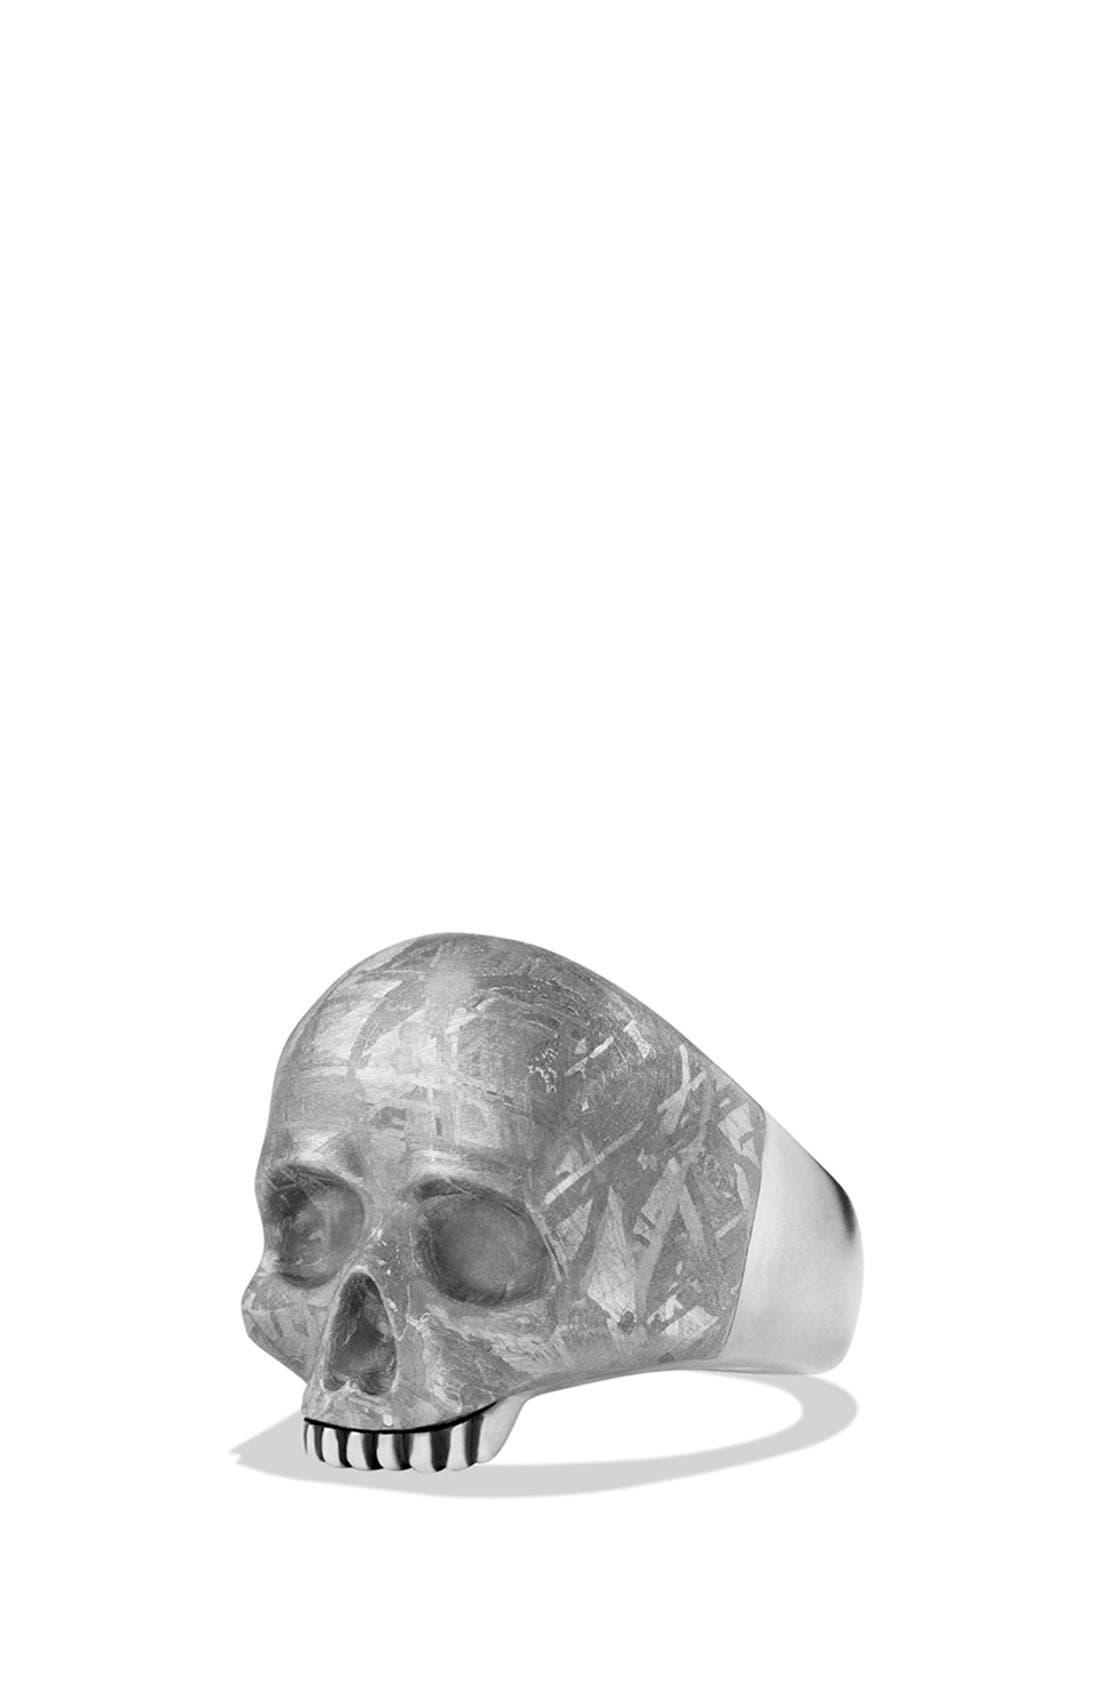 Main Image - David Yurman 'Skull' Ring with Carved Meteorite